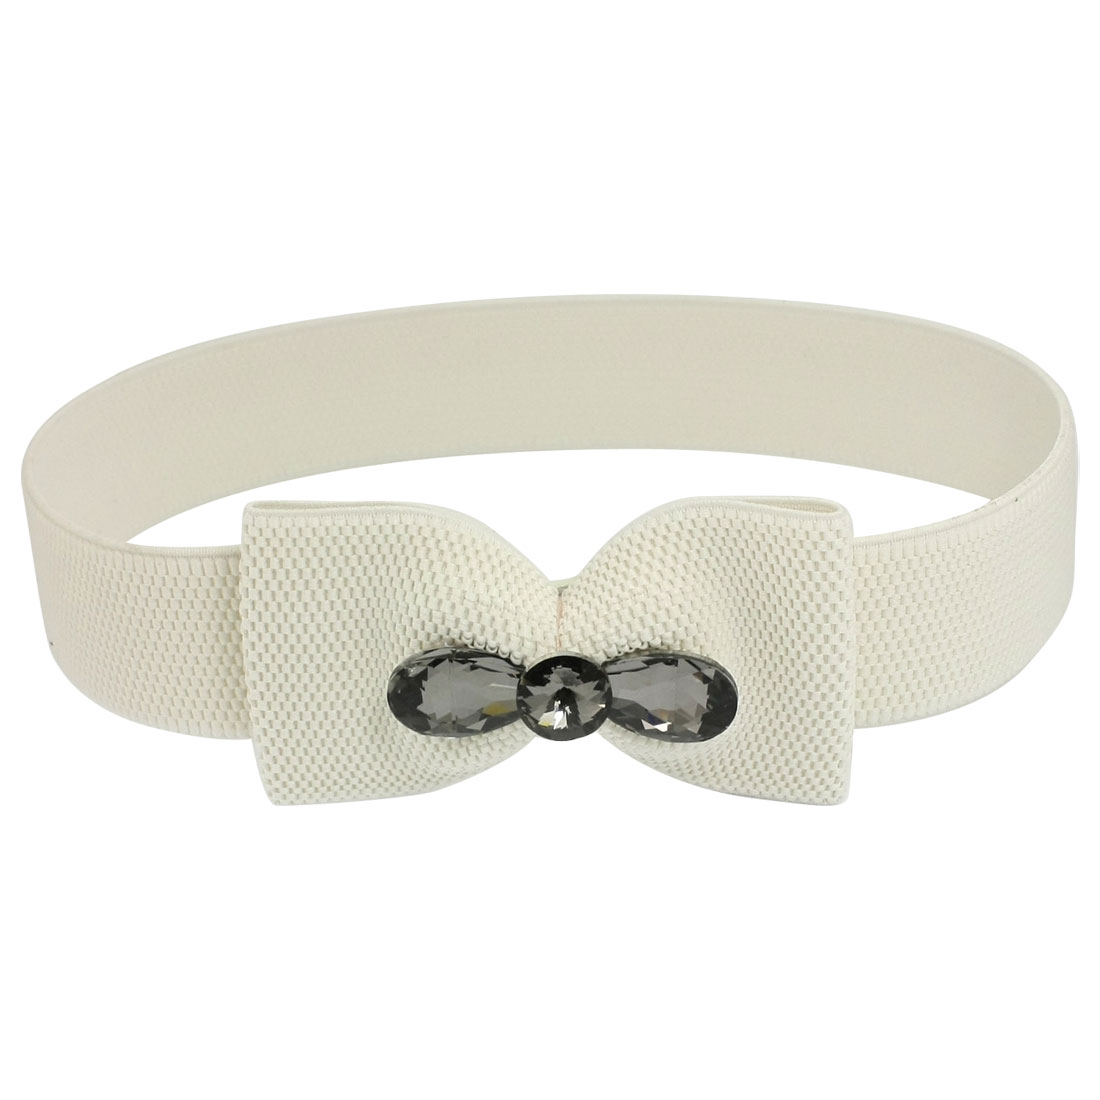 Lady Press Button Bowknot Buckle Waist Belt Corset Band Cinch White